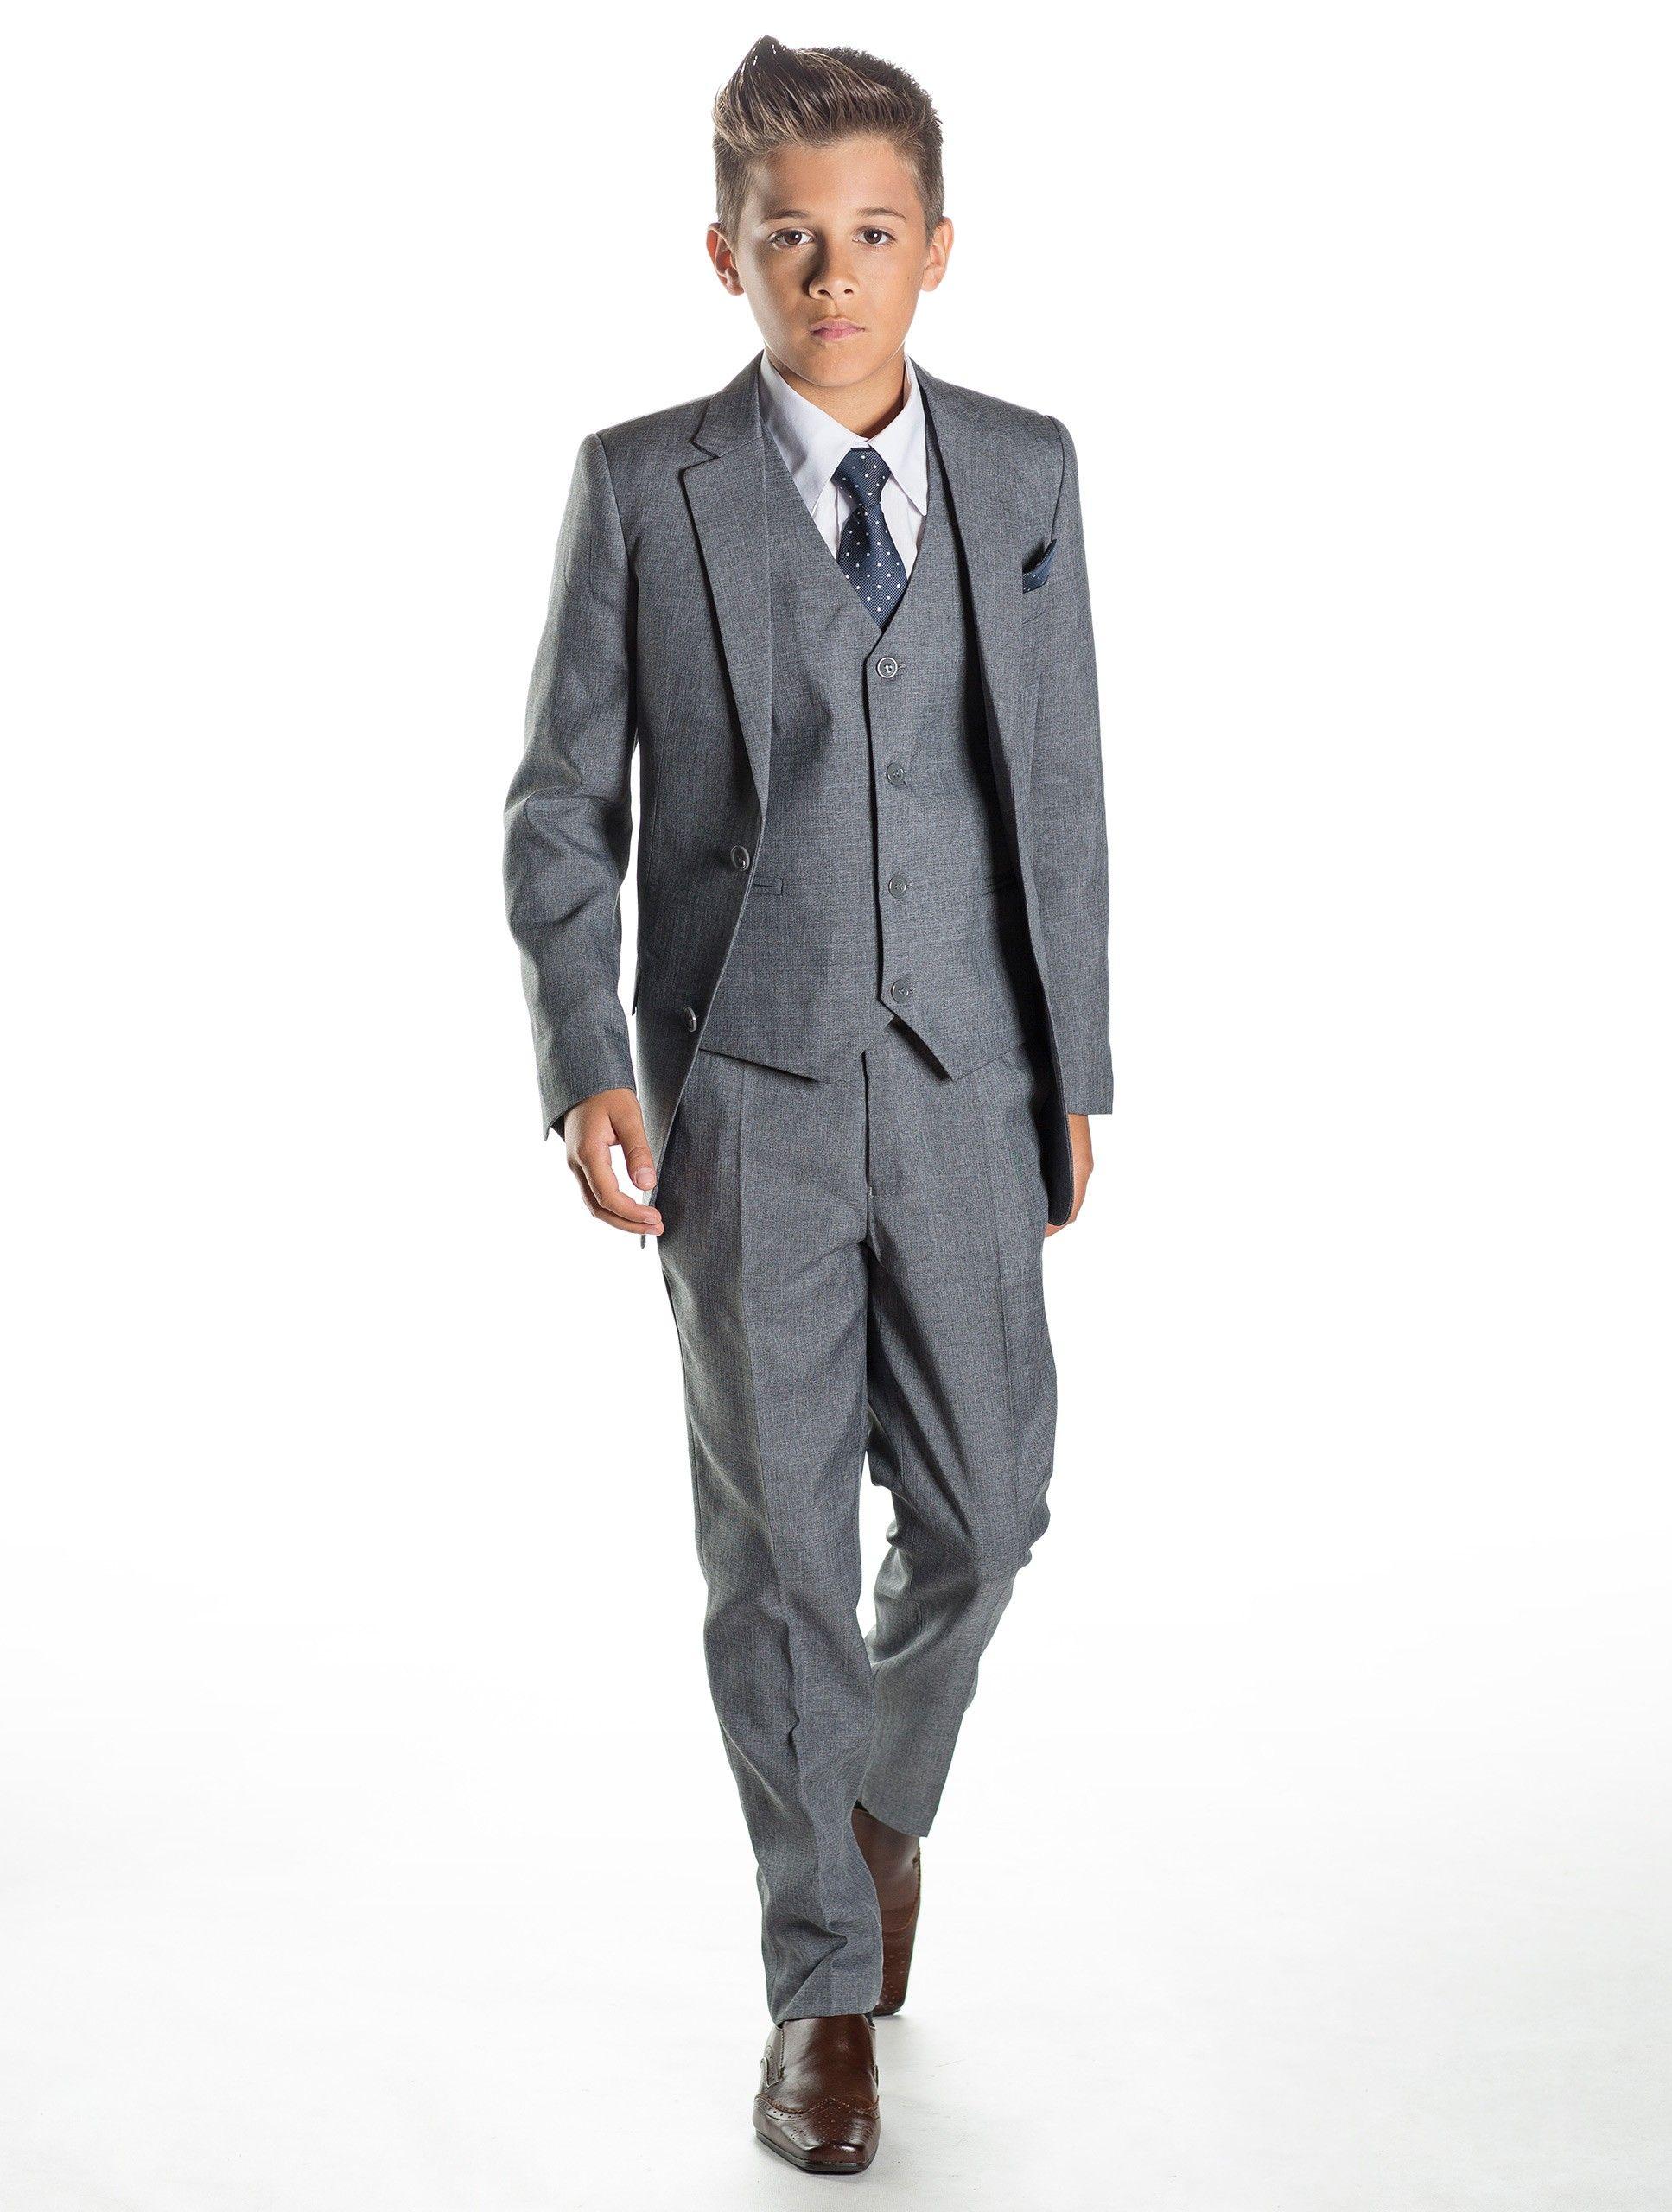 Boys grey slim fit suit - Philip | Boys wedding suits, Wedding suits ...